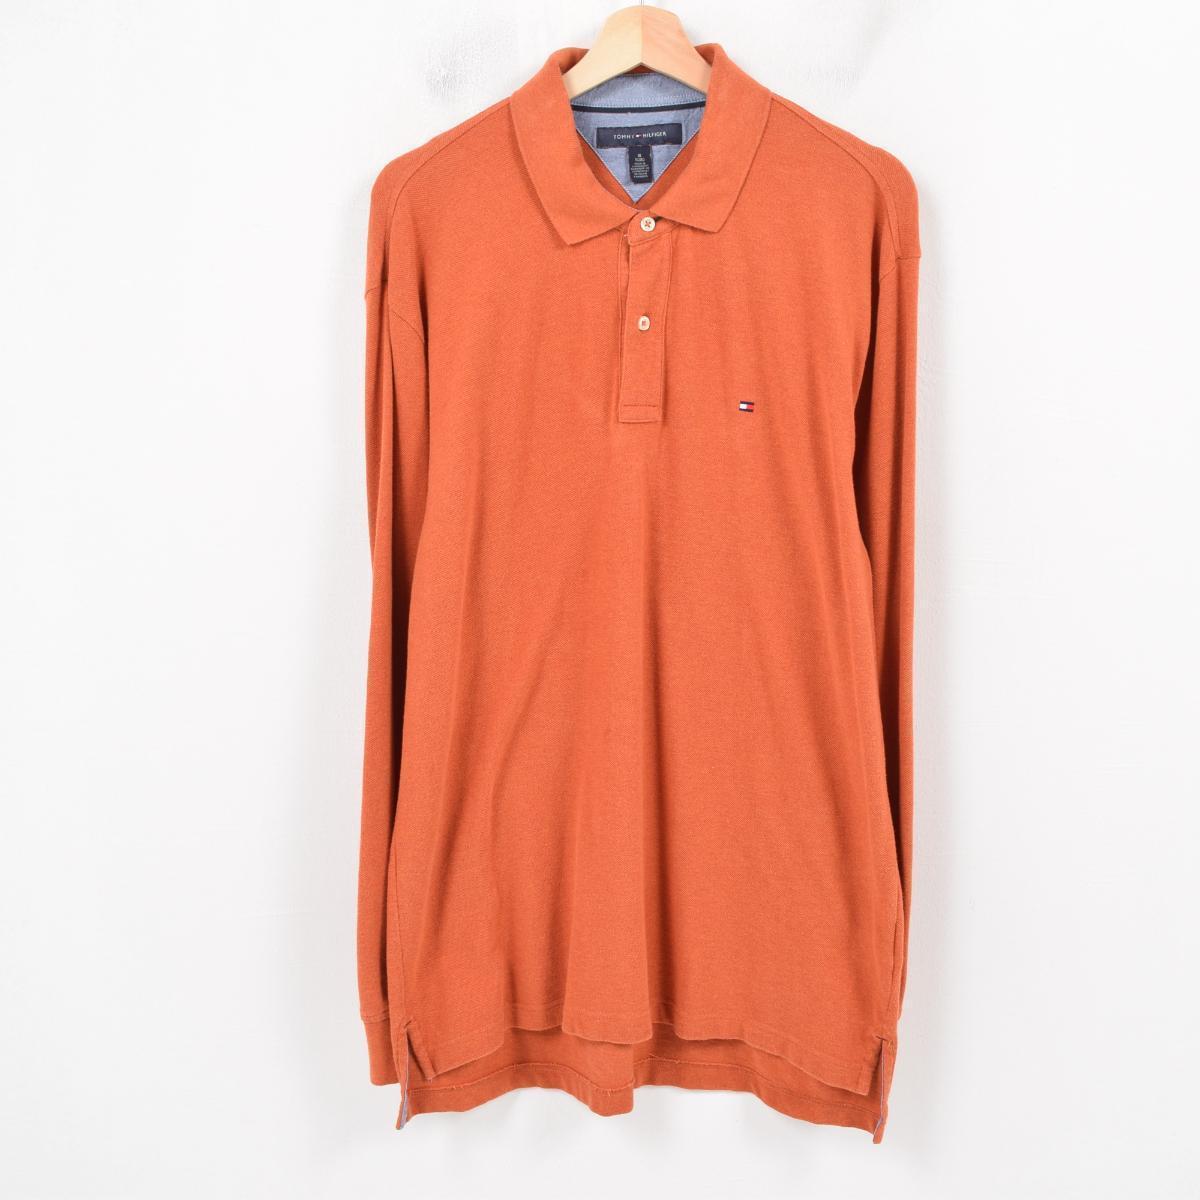 8048096e トミーヒルフィガー TOMMY HILFIGER long sleeves polo shirt men L /wau8290 ...